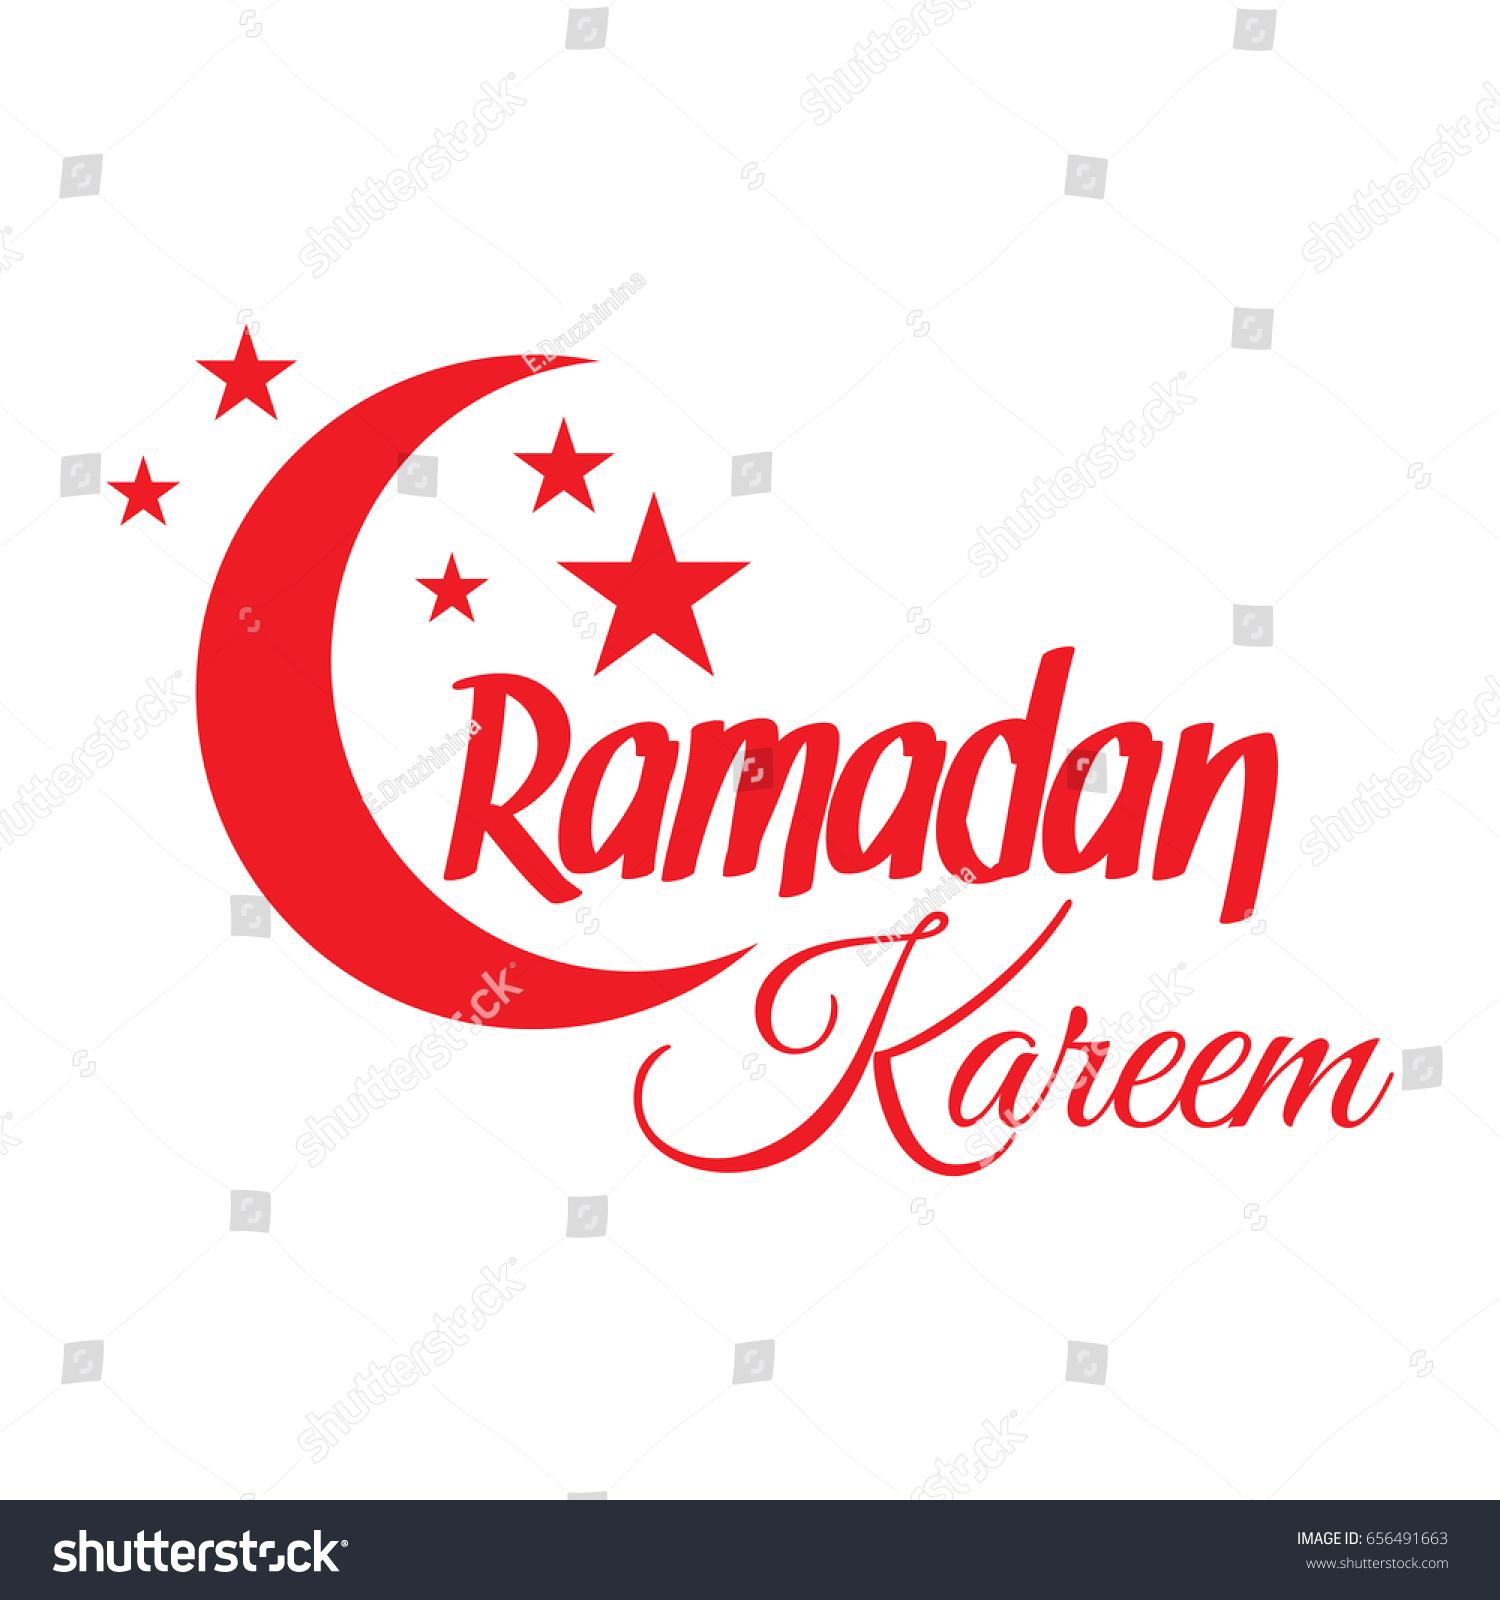 Ramadan Kareem Greeting Card Islamic Crescent Stock Vector (Royalty ...